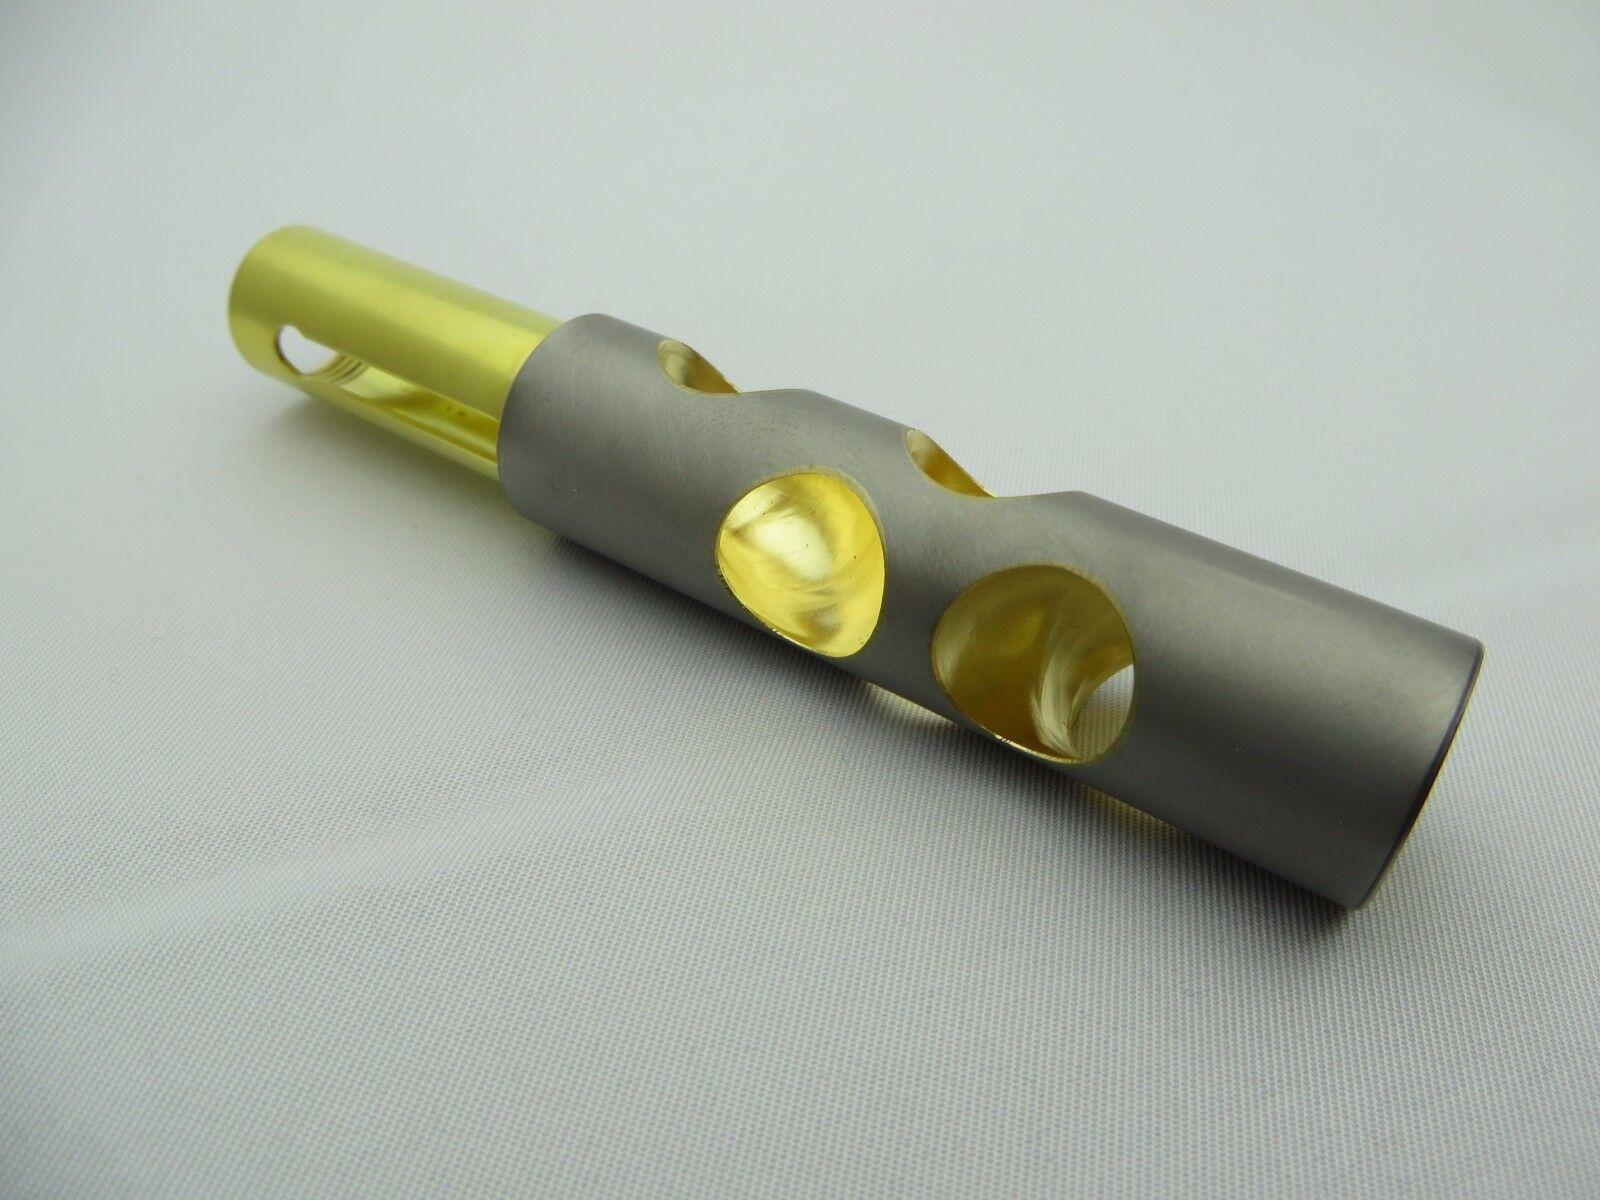 Genuine Yamaha Trumpet Piston No. 1 for Xeno Trumpets NEW  D1